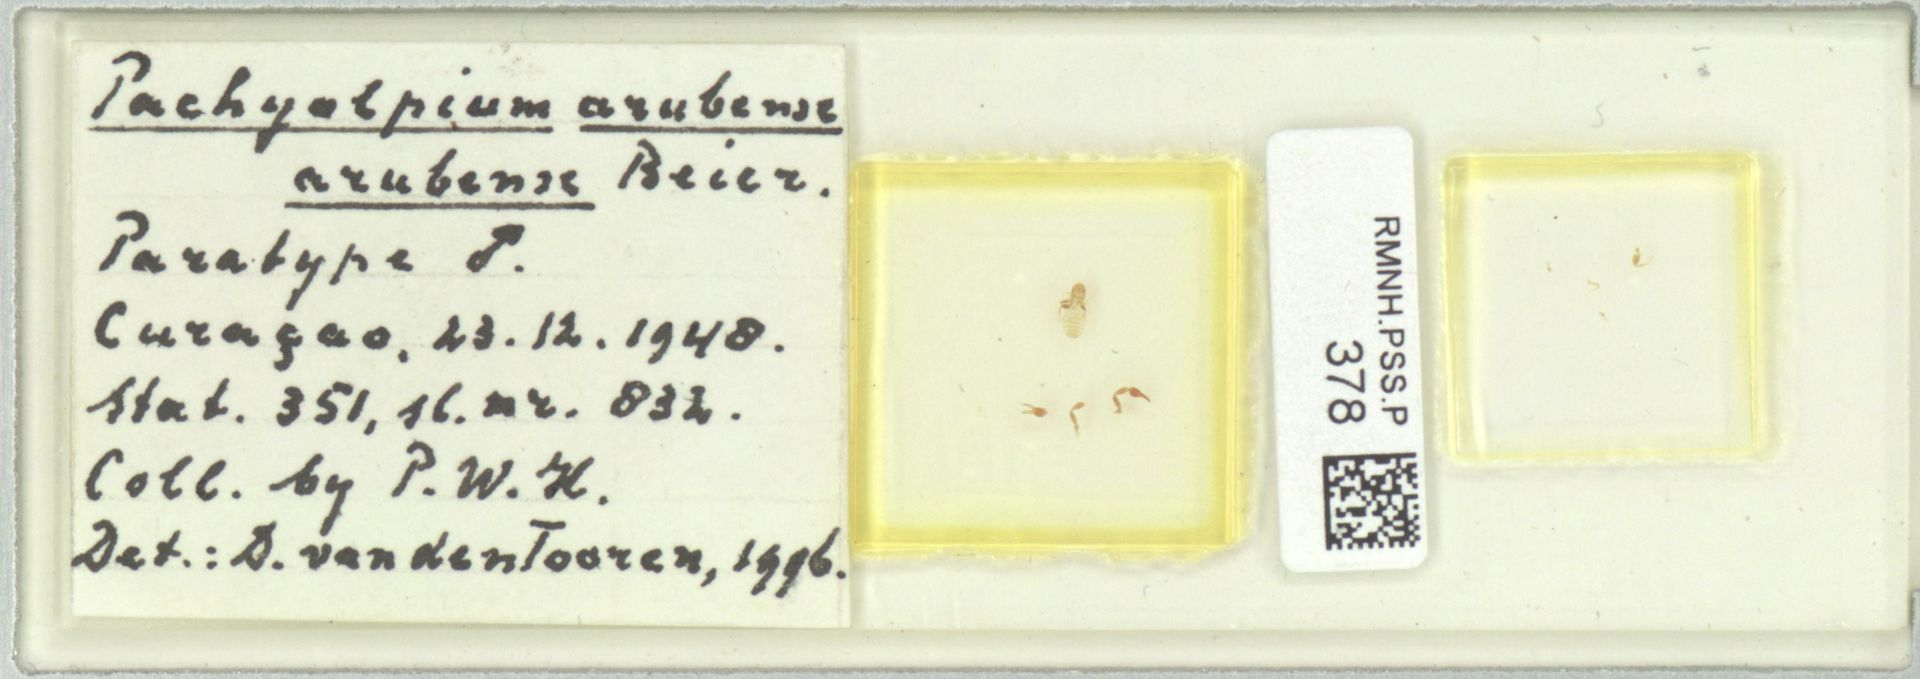 RMNH.PSS.P.378 | Pachyolpium arubense arubense